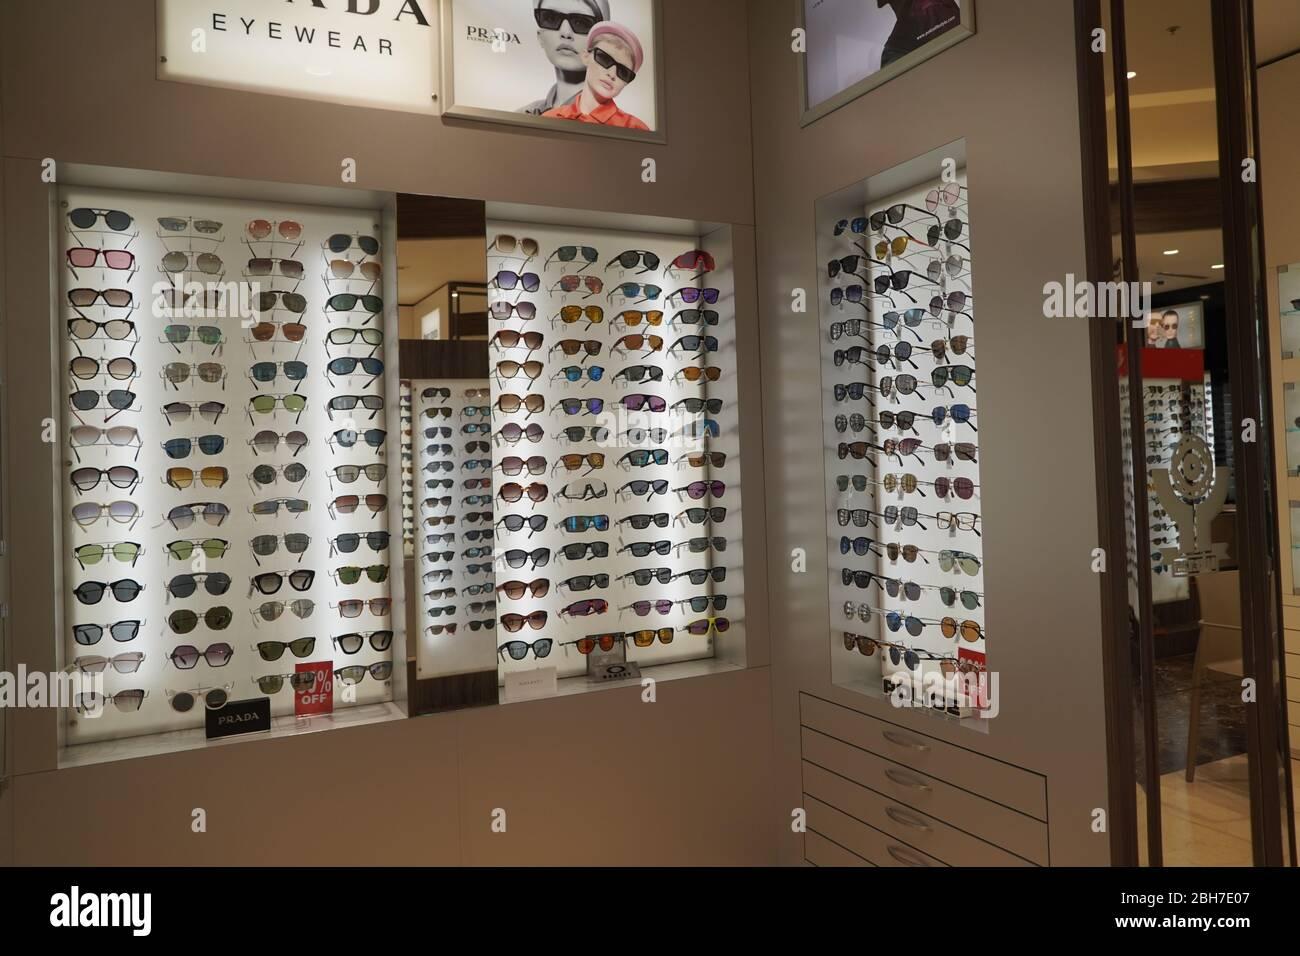 Dubai UAE December 2019 Sunglasses in a store. Sales rack of sunglasses. Prada, Dior, Roberto Cavalli, Ray Ban sunglasses. Close up of rows of sunglas Stock Photo